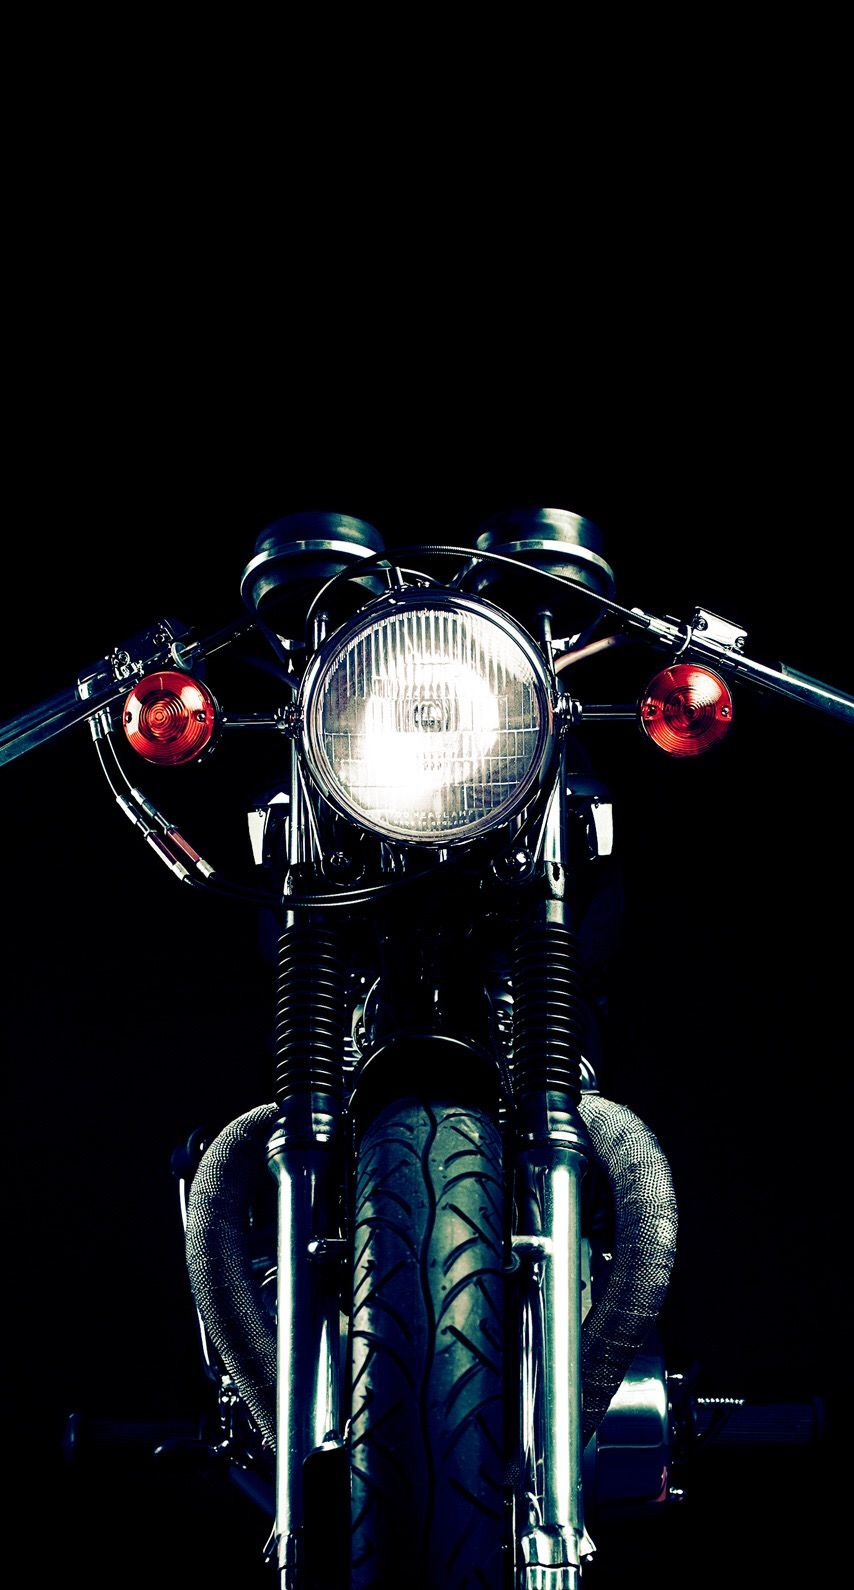 Harleydavidson Motorcycle Motorbikes Wallpaper Iphone Android